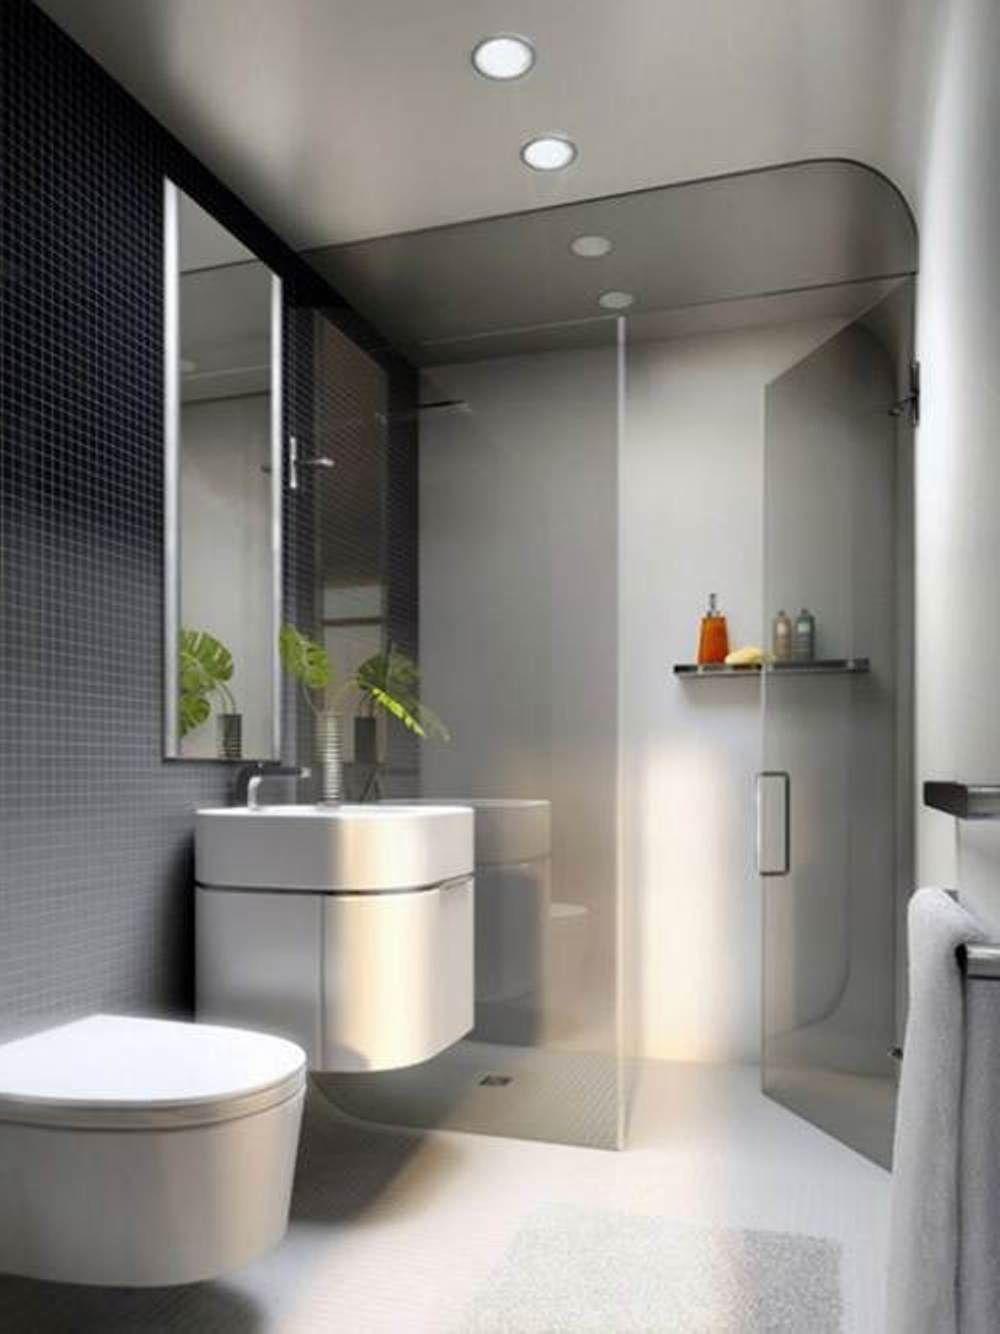 7 Essential Tips For Modern Bathroom Ideas For A Stylish Look Houseminds Modern Small Bathrooms Bathroom Design Small Modern Small Apartment Bathroom